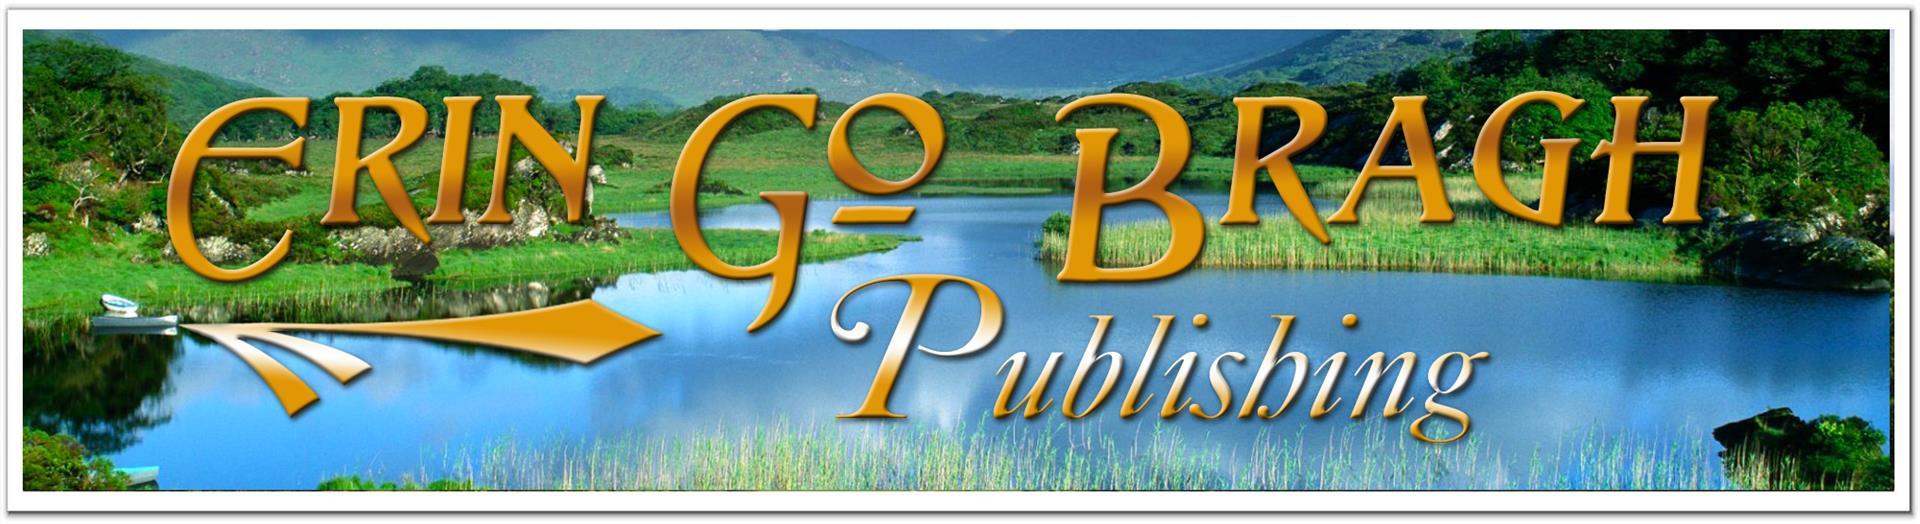 erin-go-braugh-publishing2